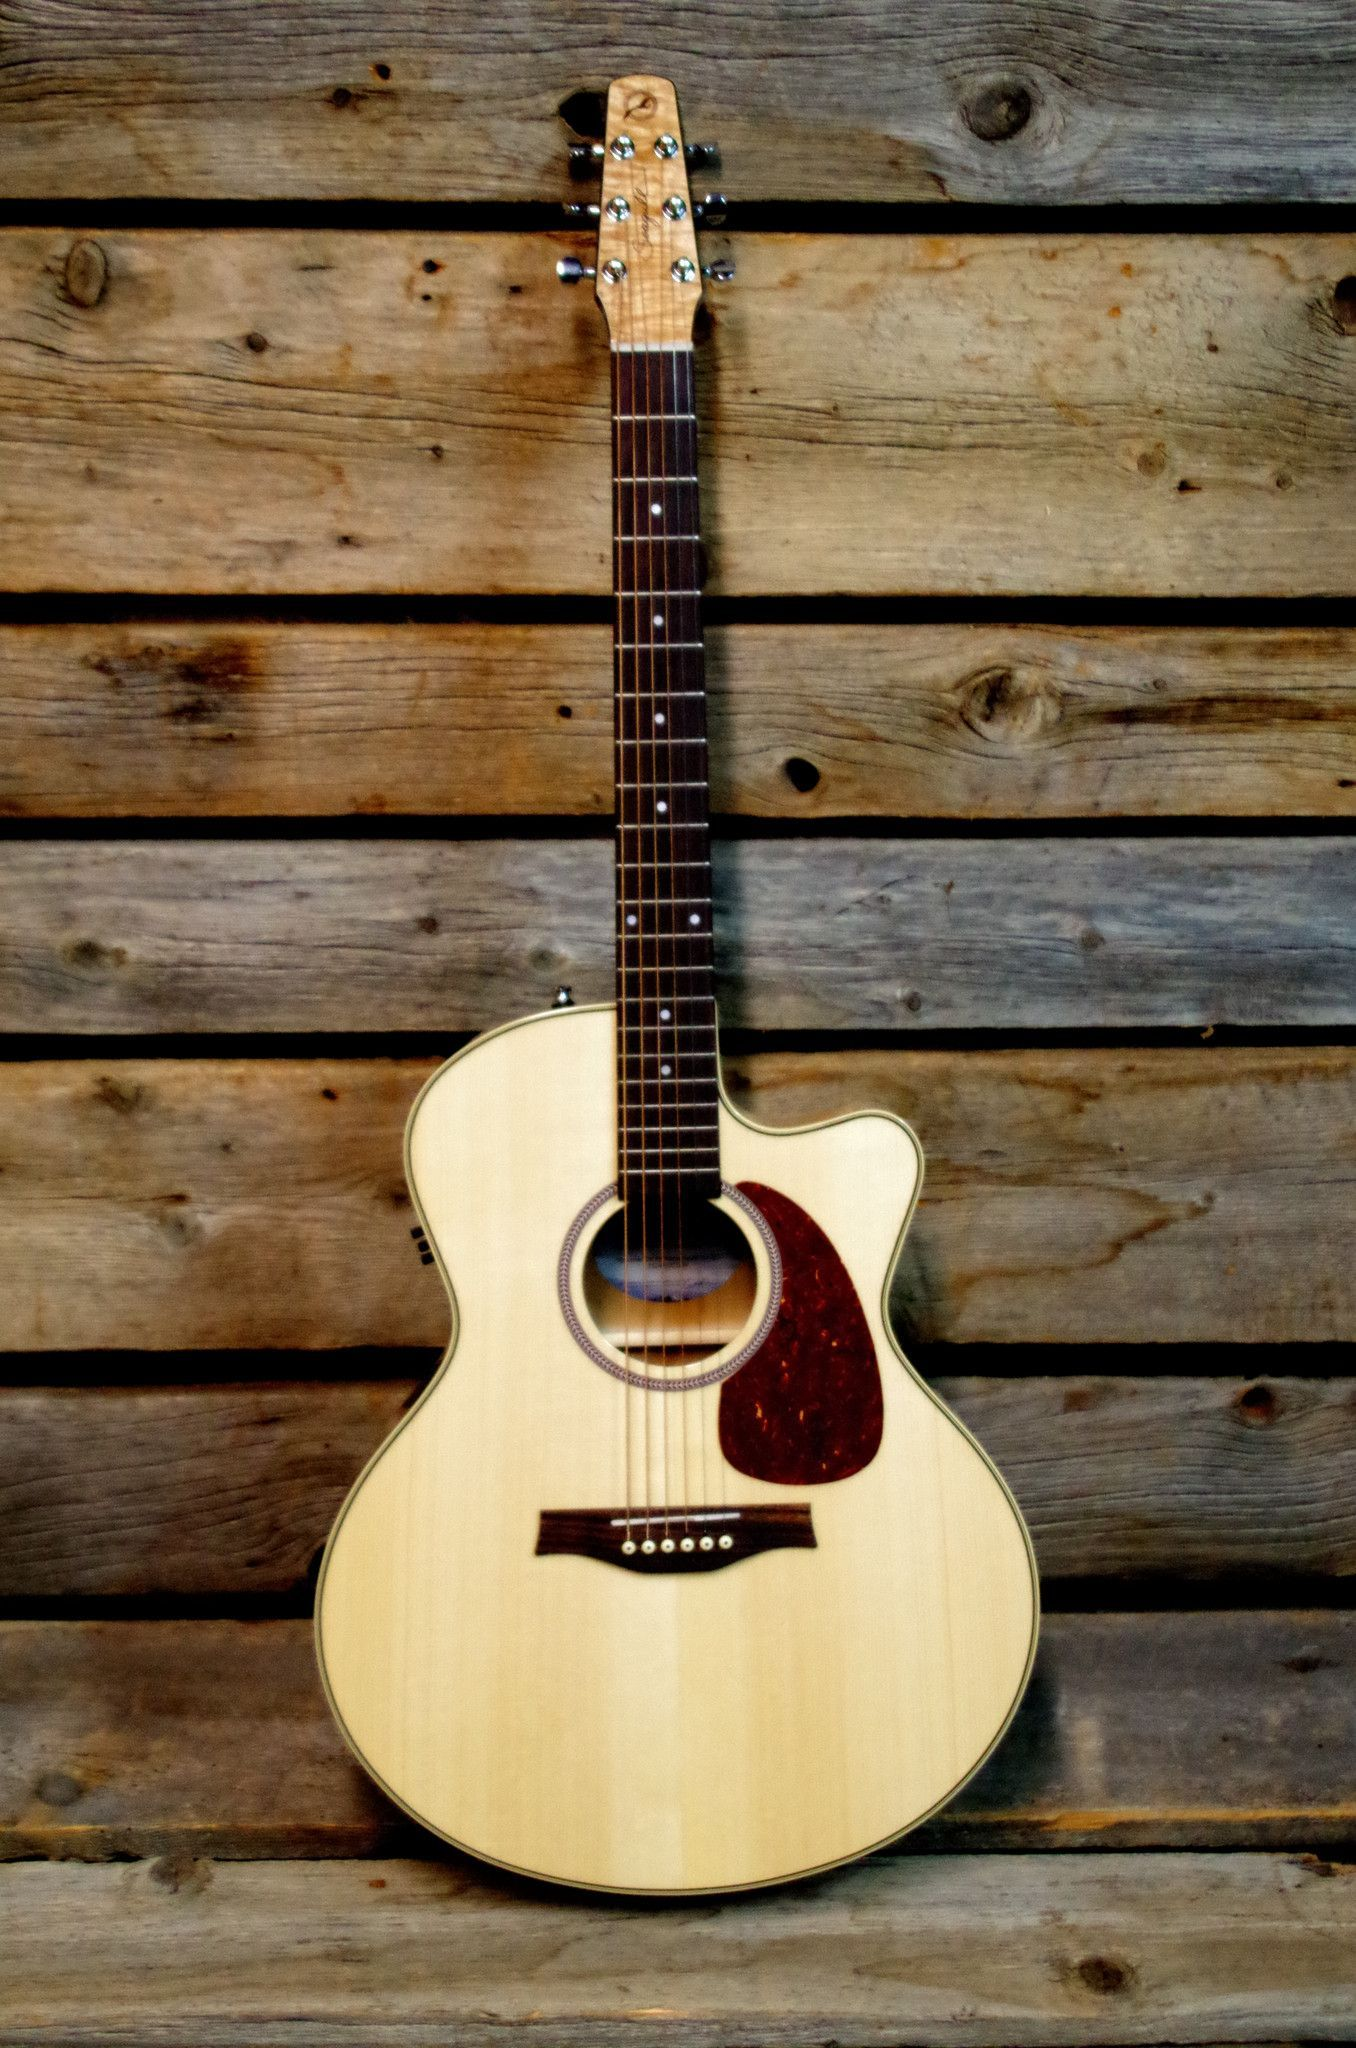 Seagull Performer Cw Mj Flame Maple Hg Qi Mini Jumbo Acoustic Electric Guitar Cool Electric Guitars Acoustic Electric Guitar Acoustic